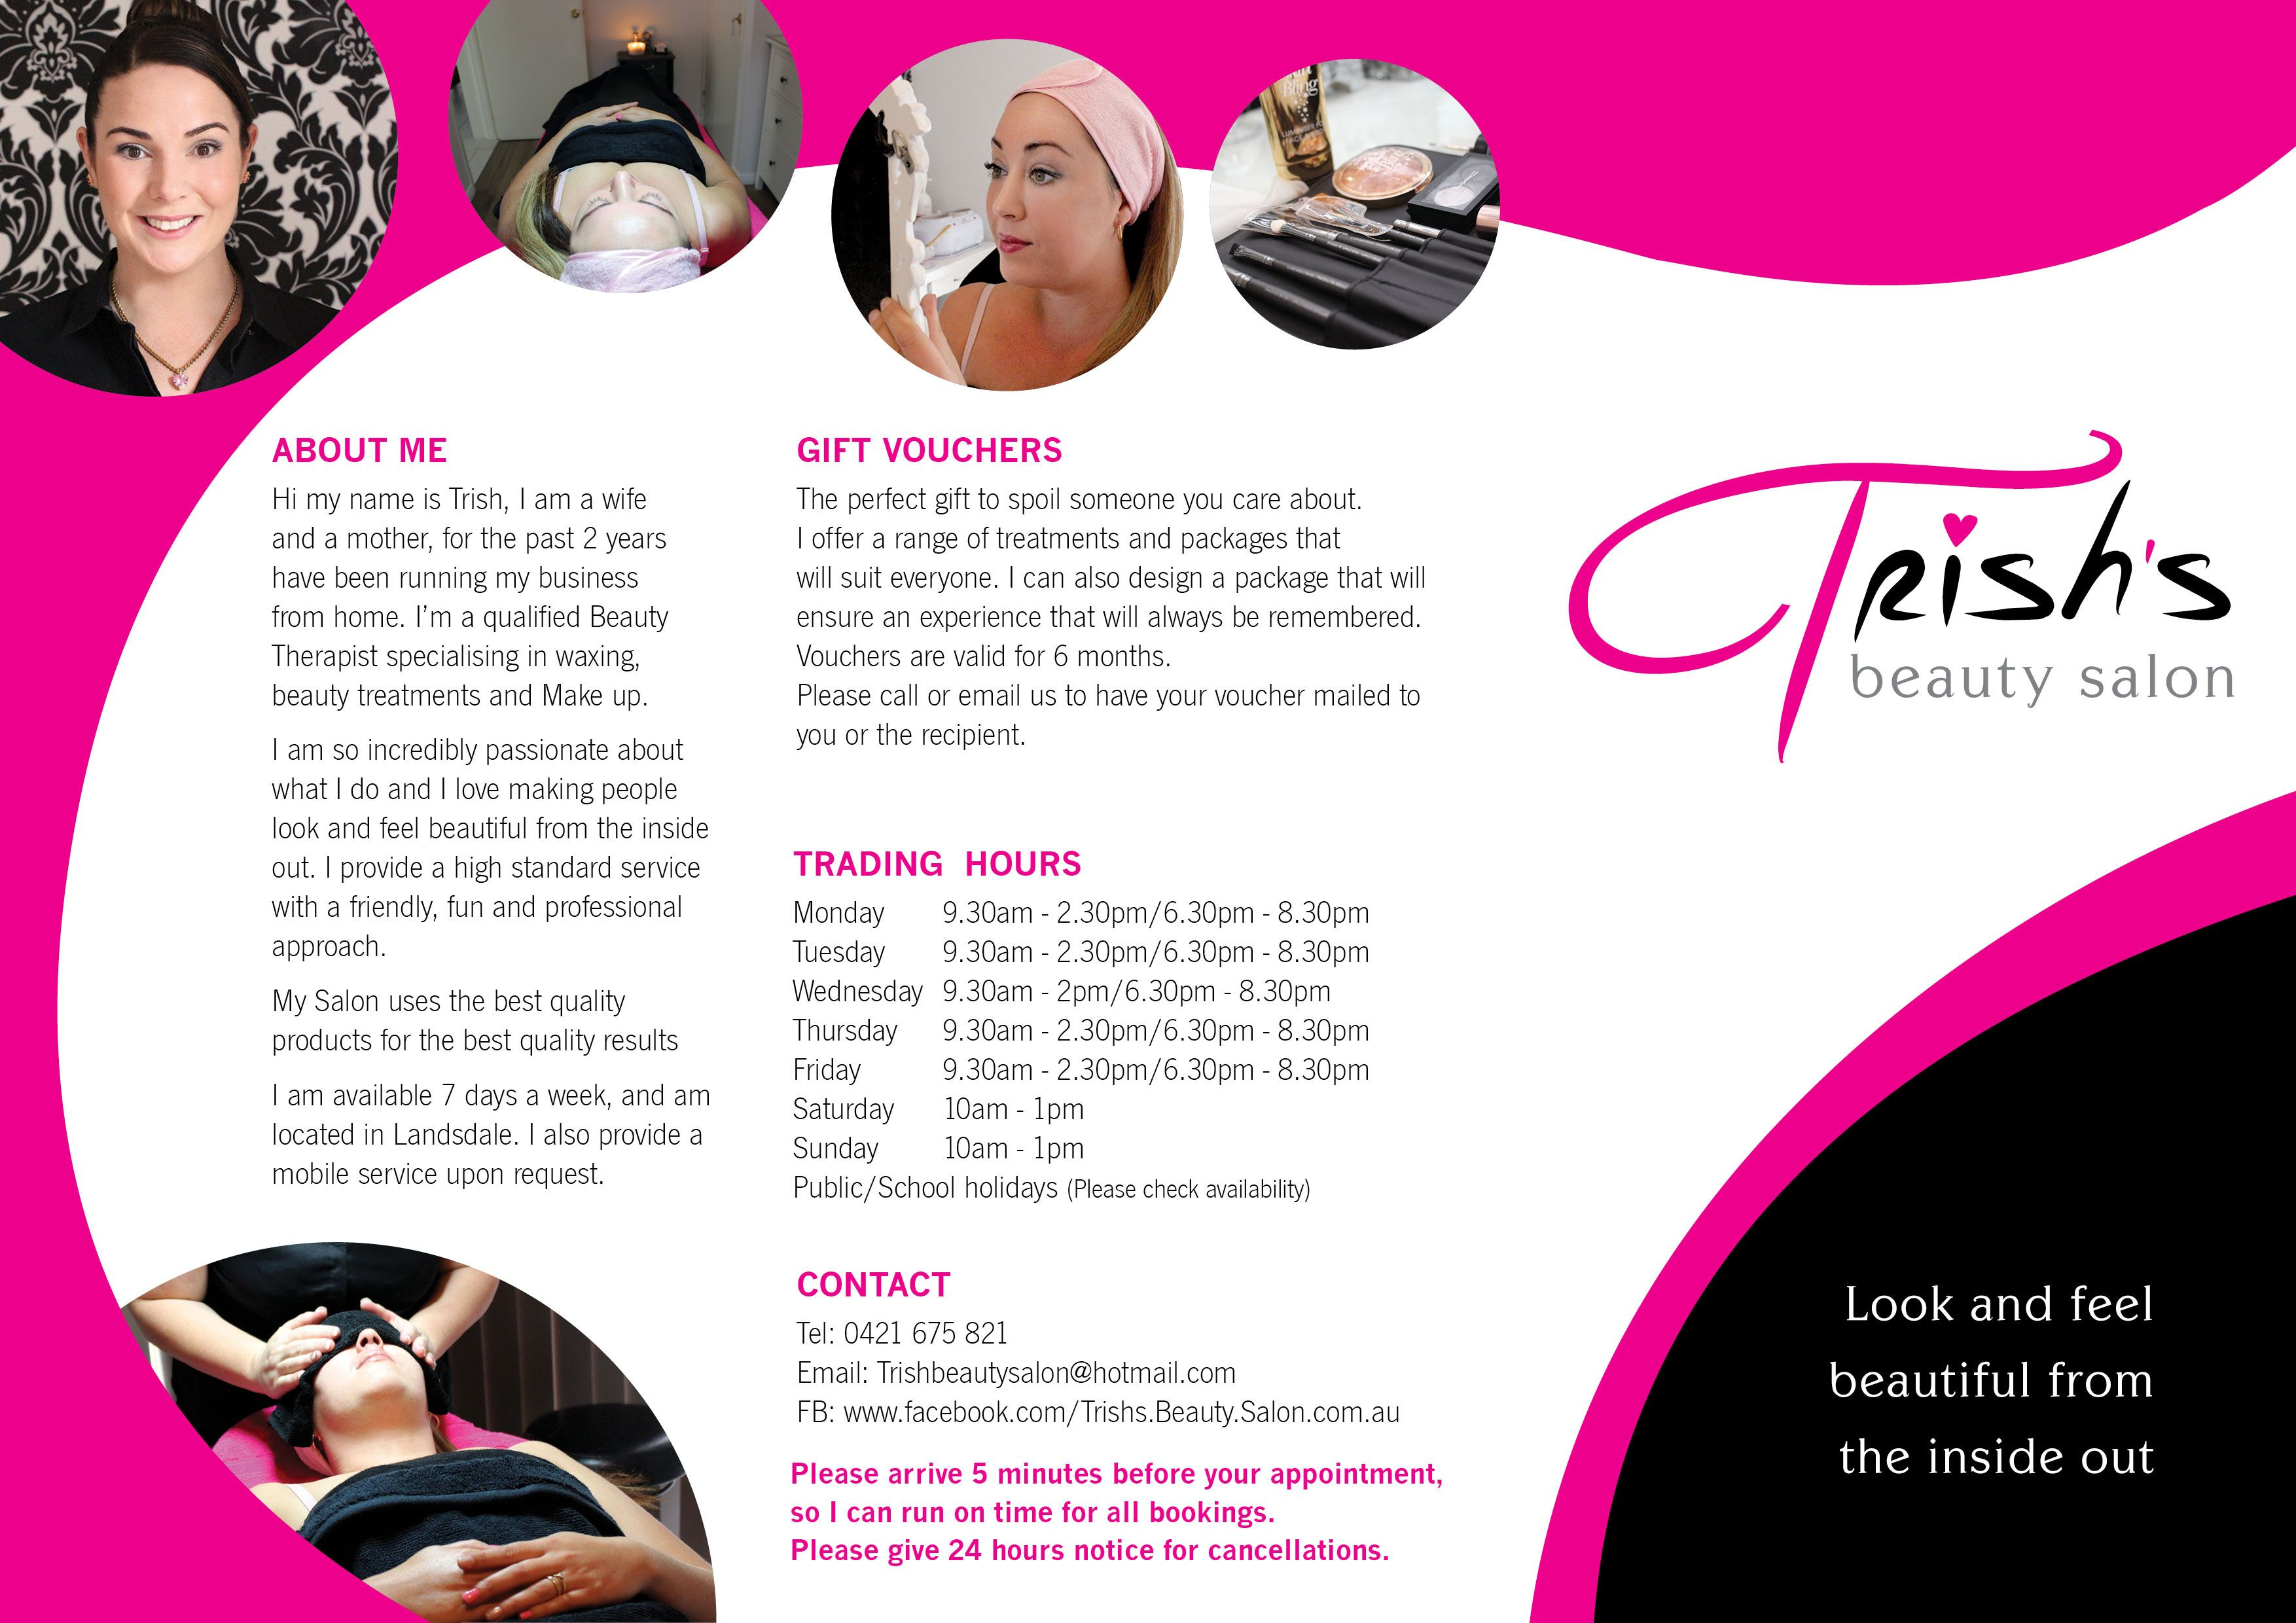 new leaflet for trish u0026 39 s beauty salon  outside